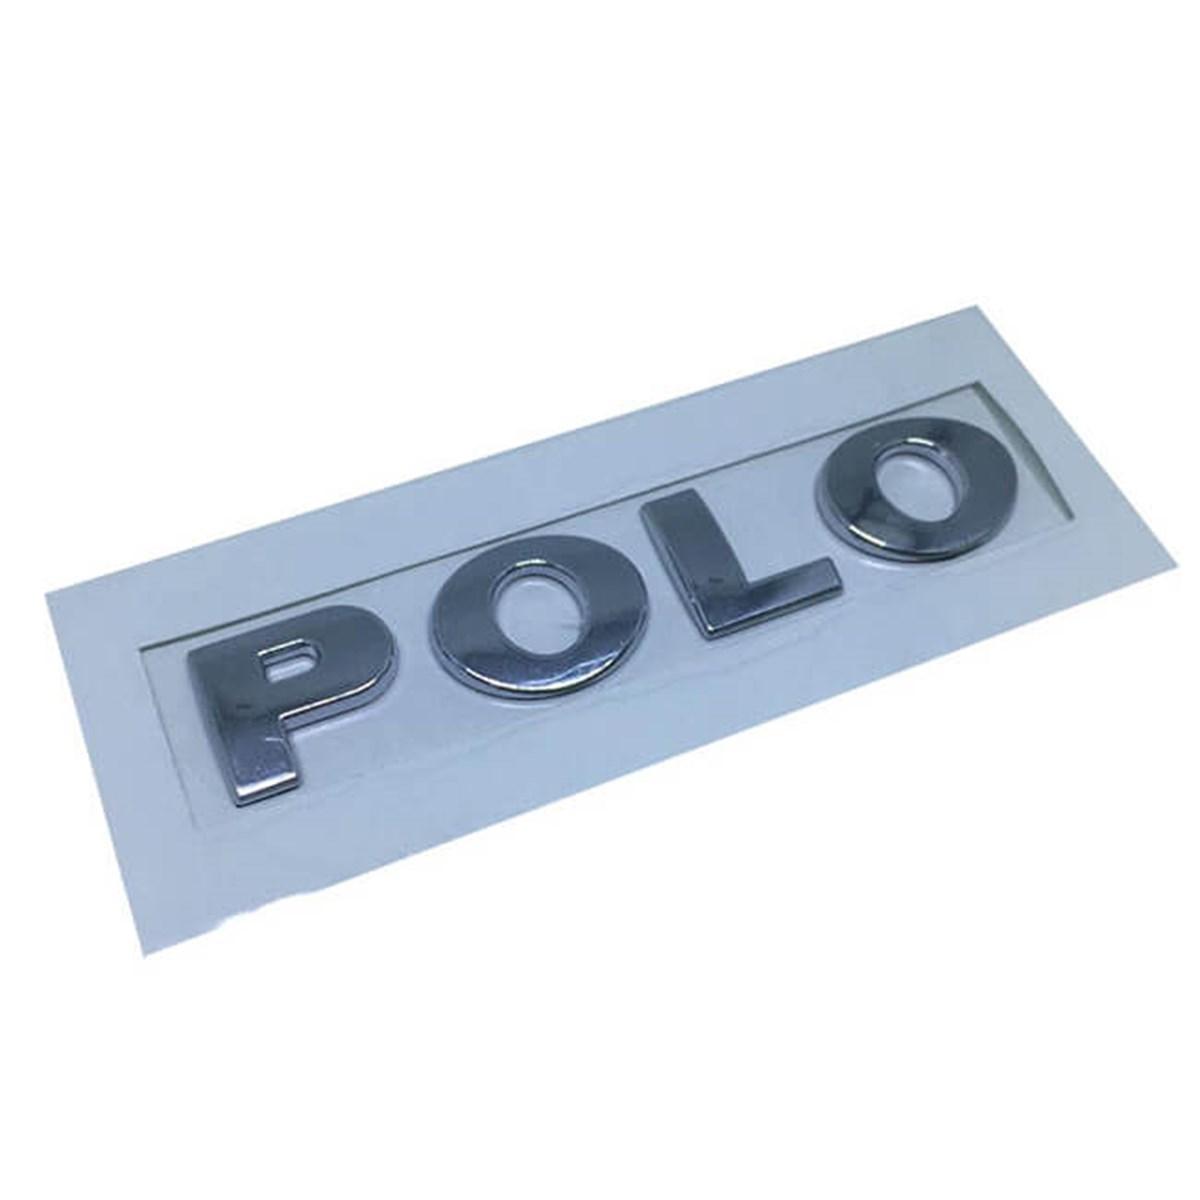 POLO   Arka yazısı - Polo Hb - Polo Classic